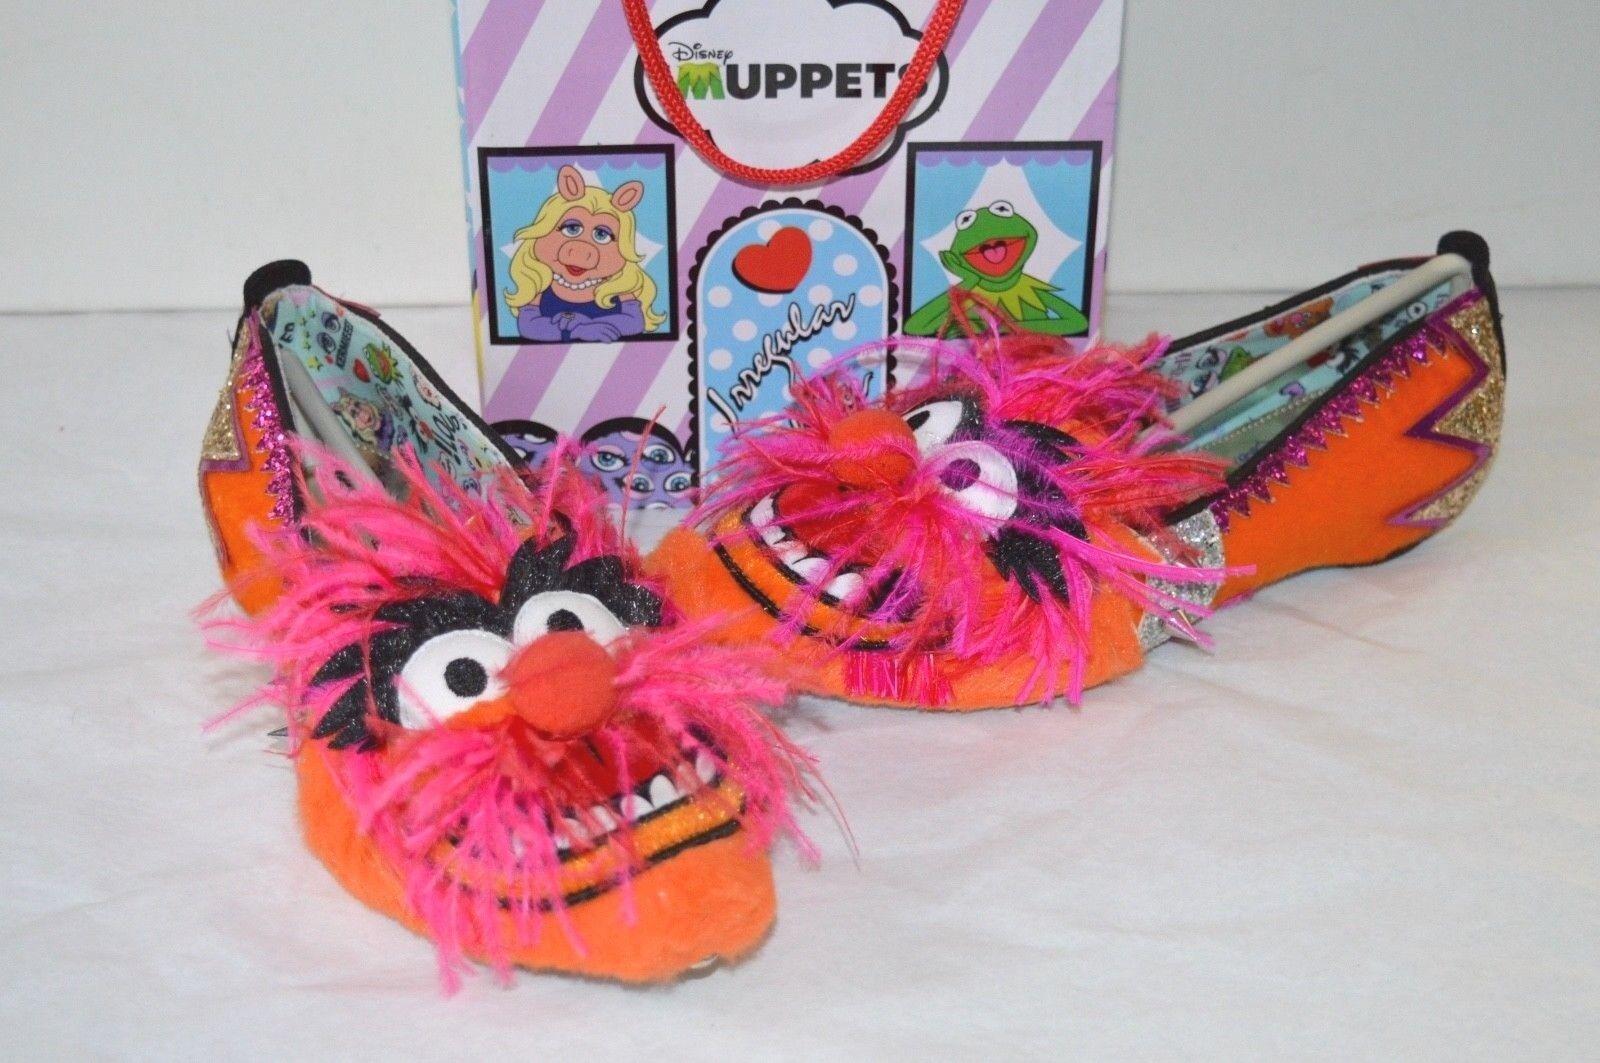 New Irregular Choice The Muppets Party Animal Flats Magenta orange gold 36 5.5-6